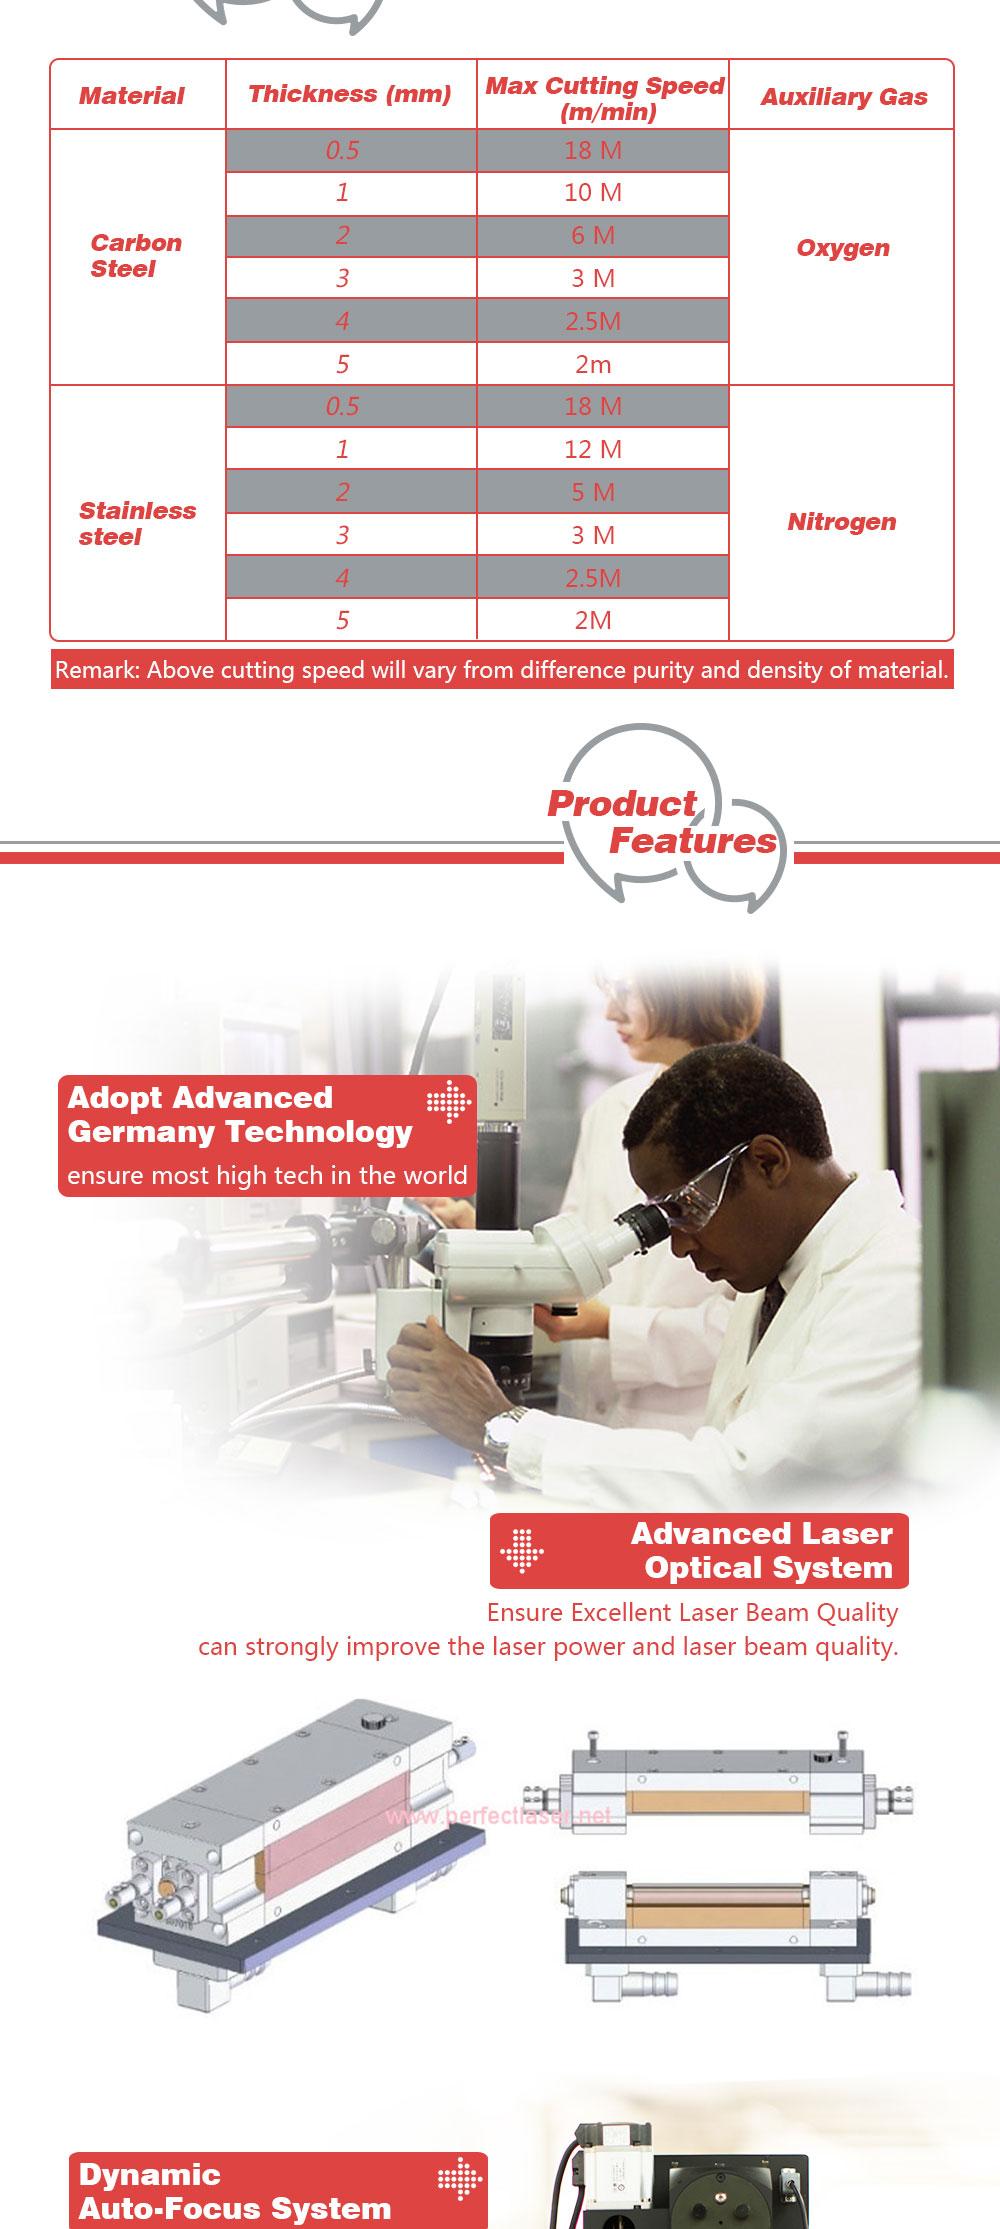 04 Perfect Laser-Fiber Laser Cutting Machine.jpg